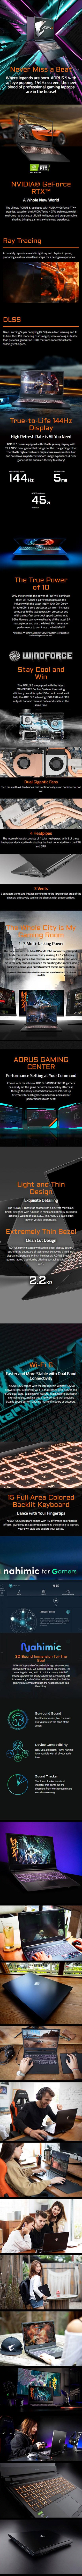 "Gigabyte AORUS 5 MB 15.6"" 144Hz Gaming Laptop i5-10200H 16GB 512GB 1650Ti Win10H - Desktop Overview 1"